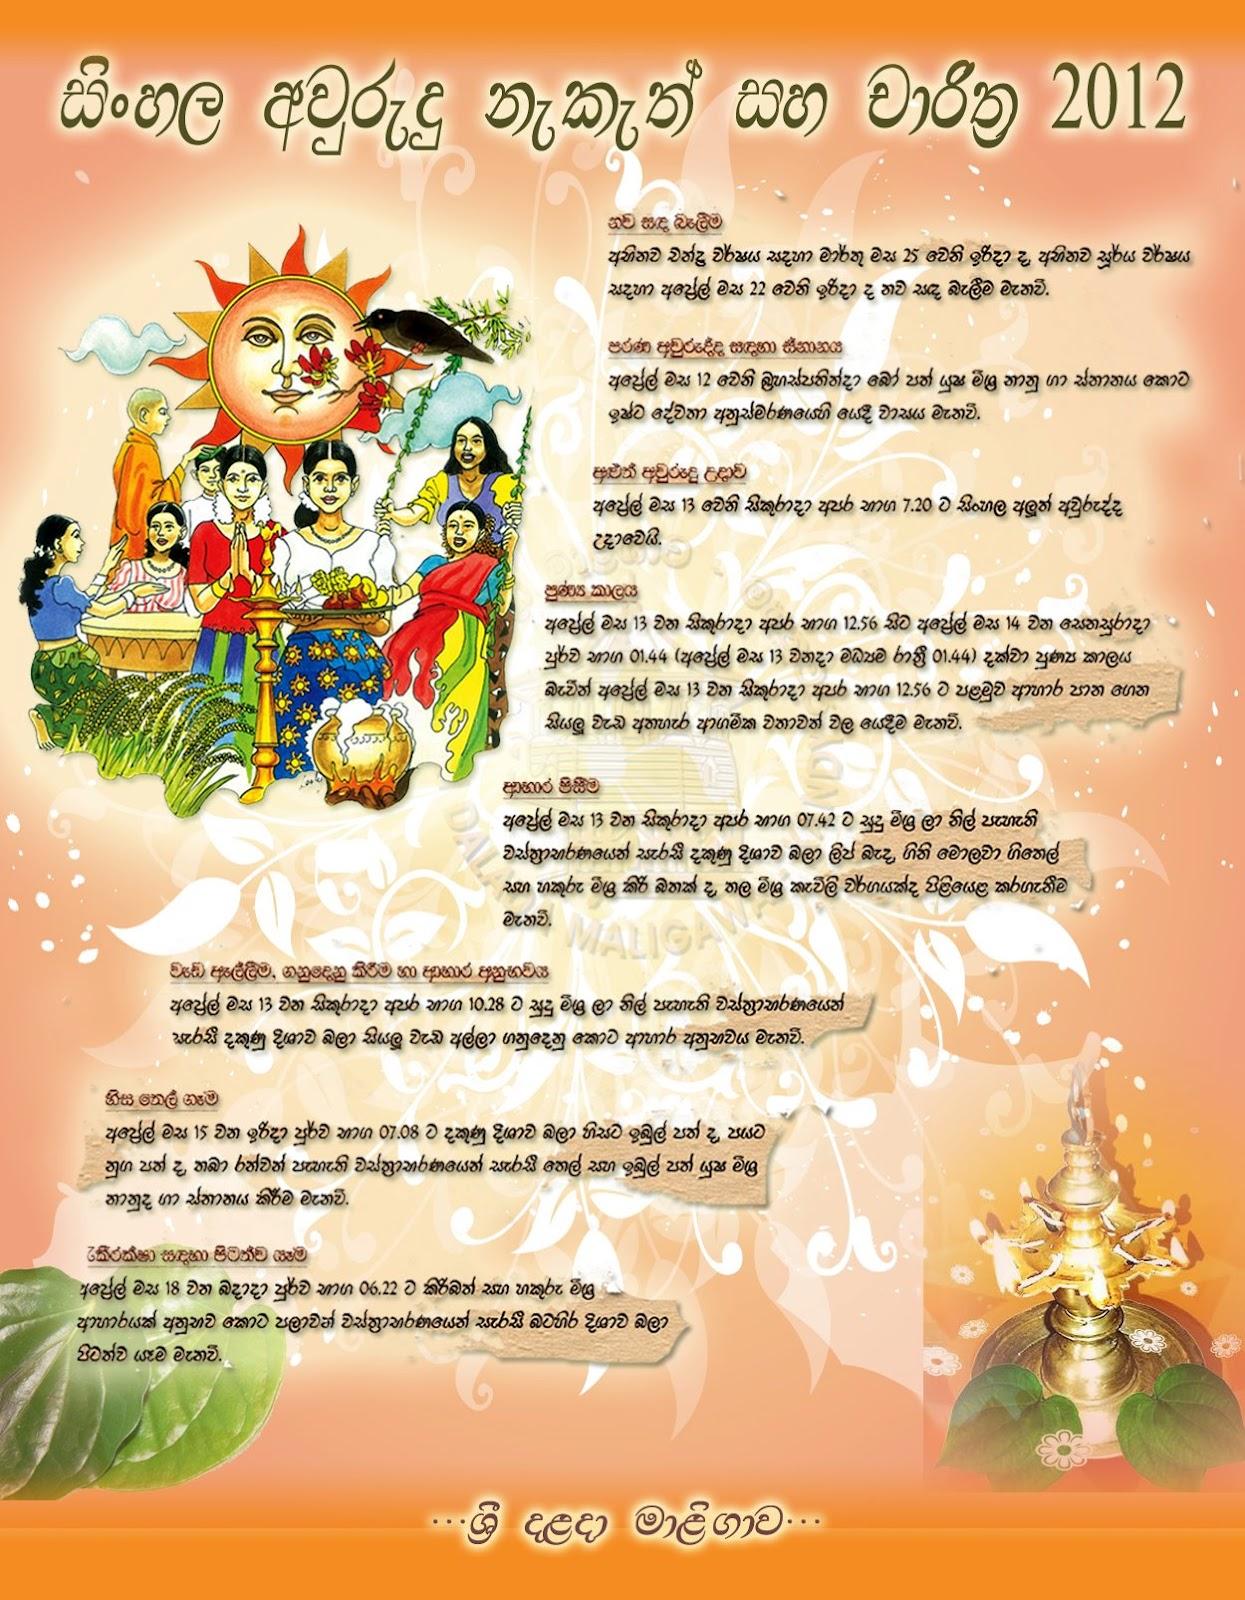 ... Sinhala Hindu New Year Celebration 2012.The Sinhala And Tamil New Year